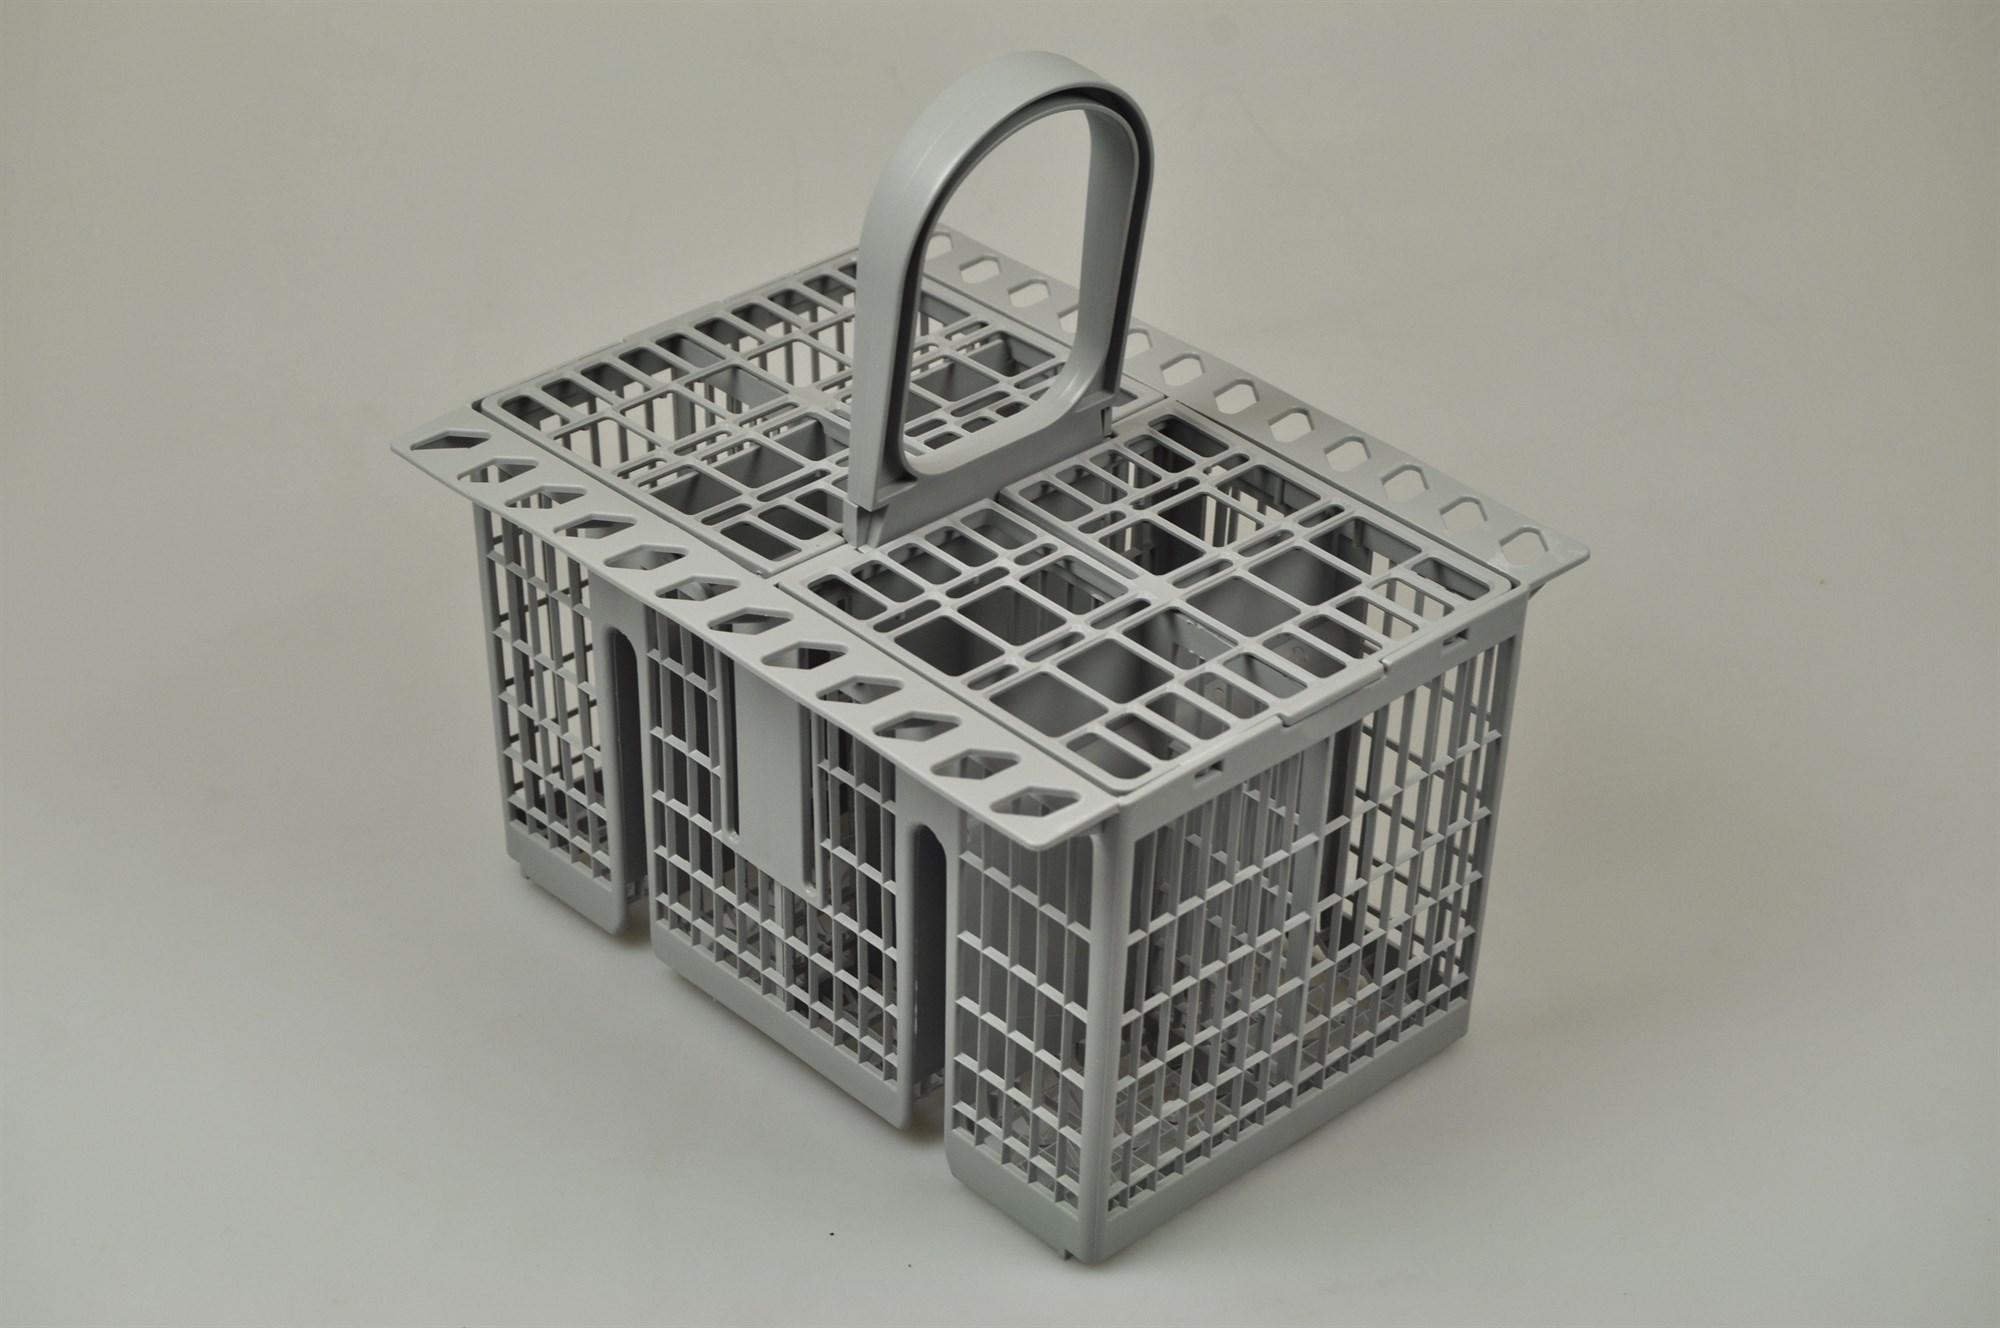 Cutlery Basket Ariston Dishwasher 120 Mm X 160 Mm